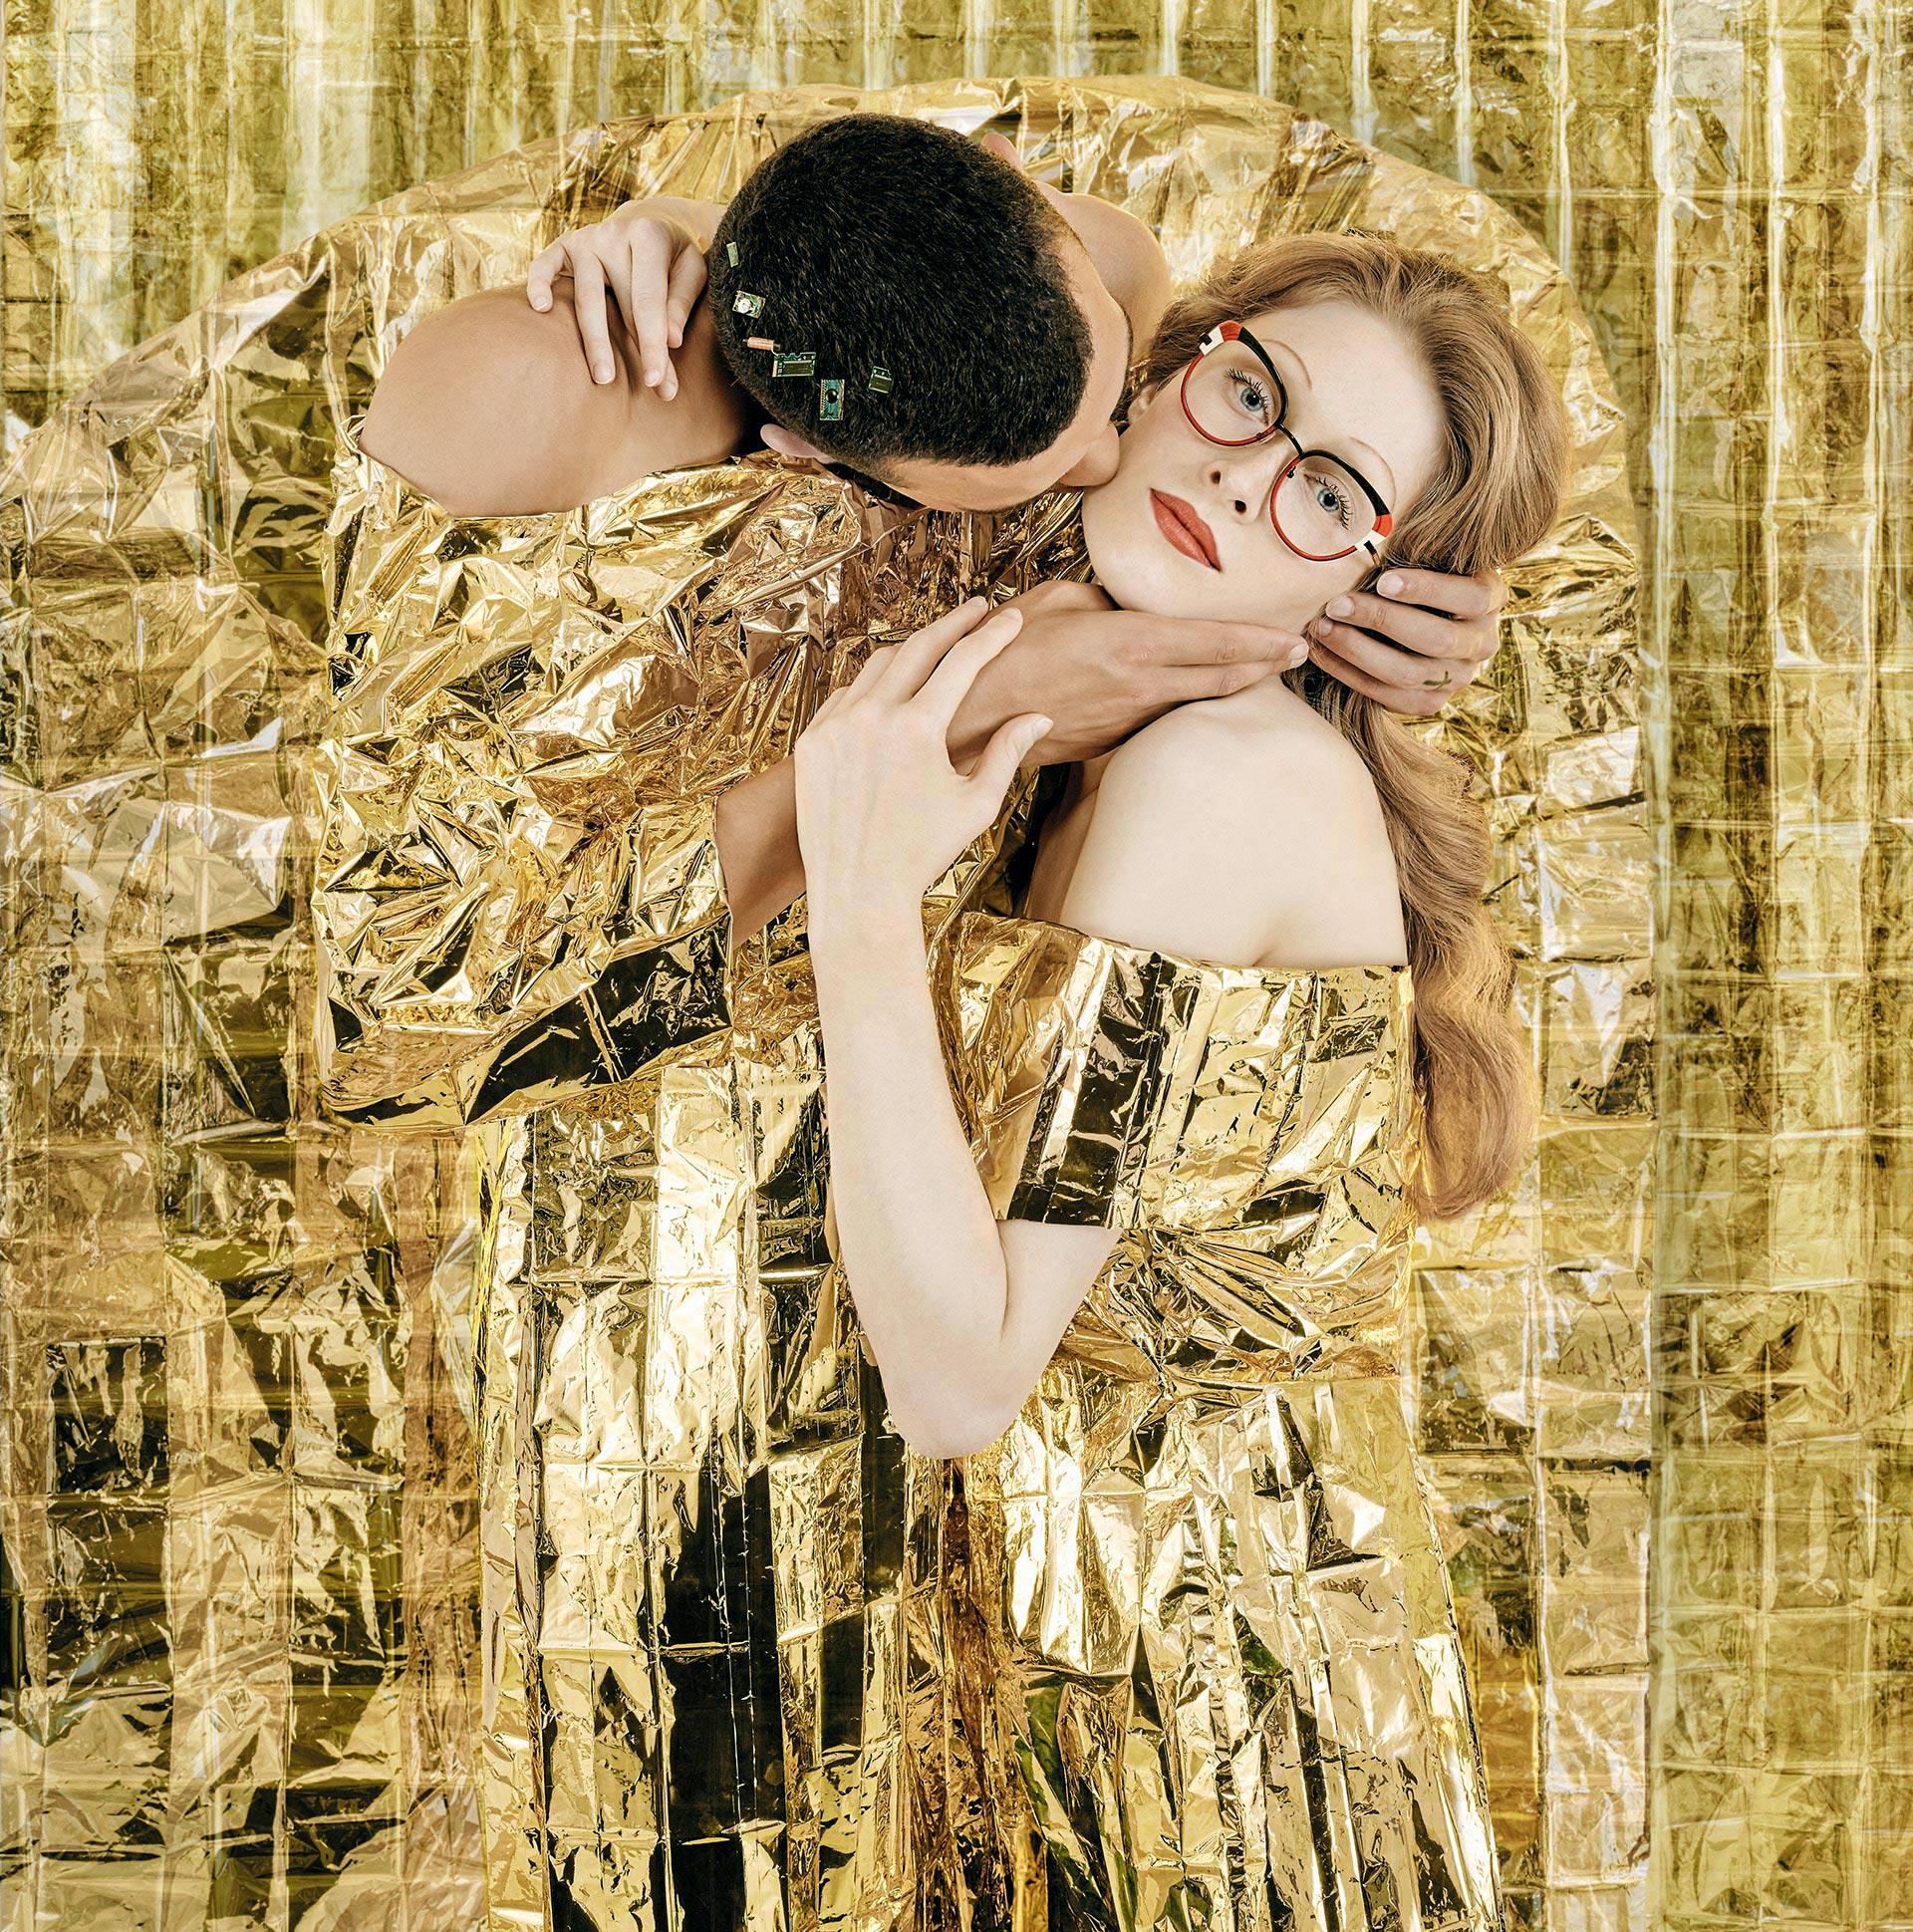 DetailsEtnia Beso Klimt Inspira BarcelonaEl The Art Of Unas De N8mvyn0Ow